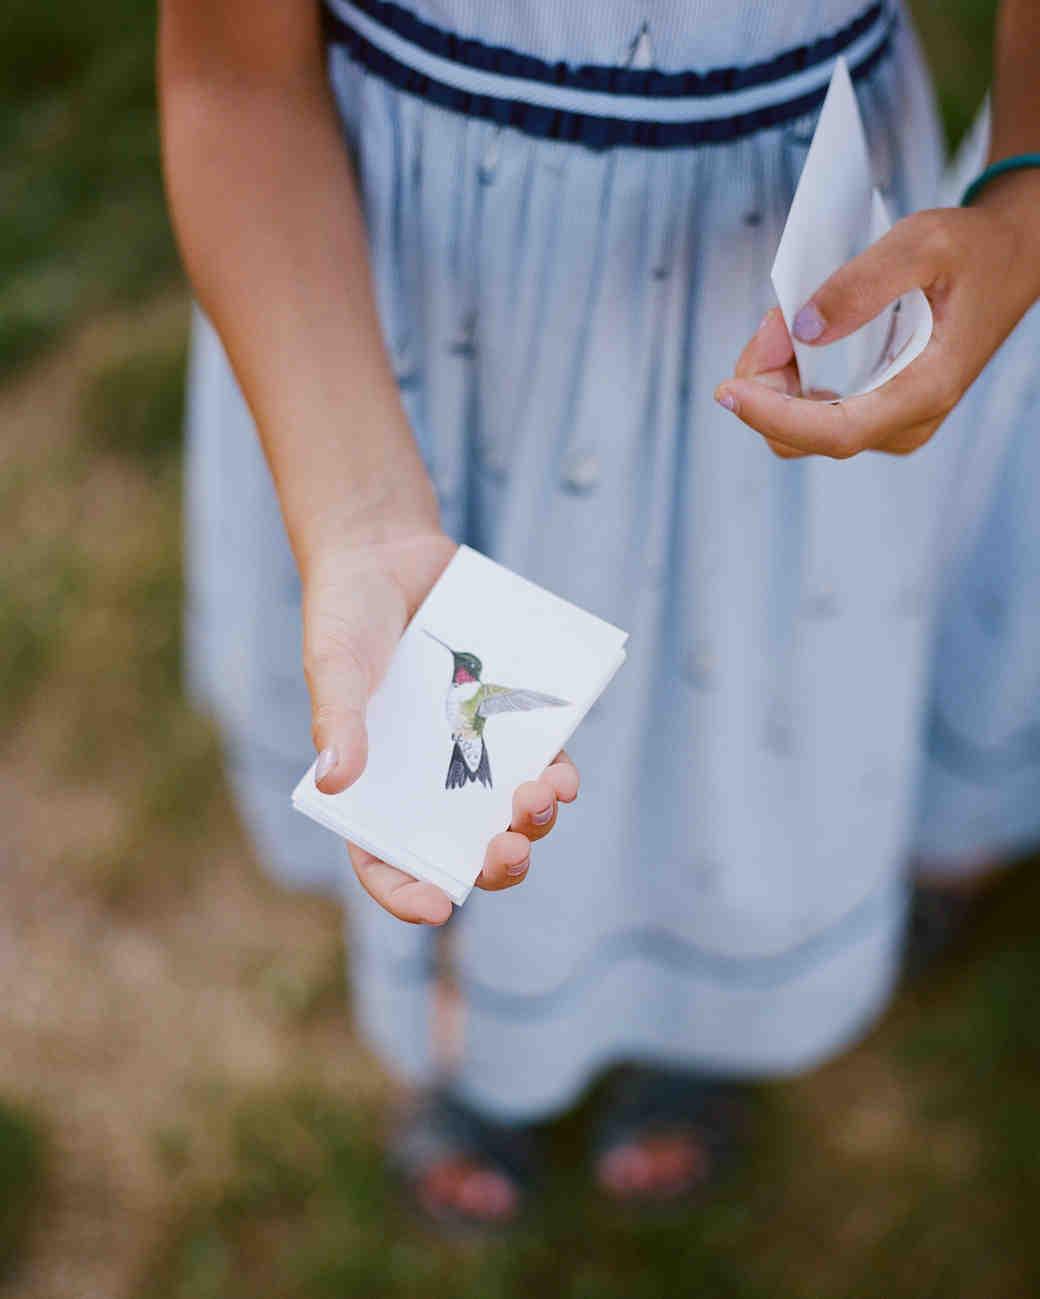 jocelyn-graham-wedding-escortcard-1081-s111847-0315.jpg